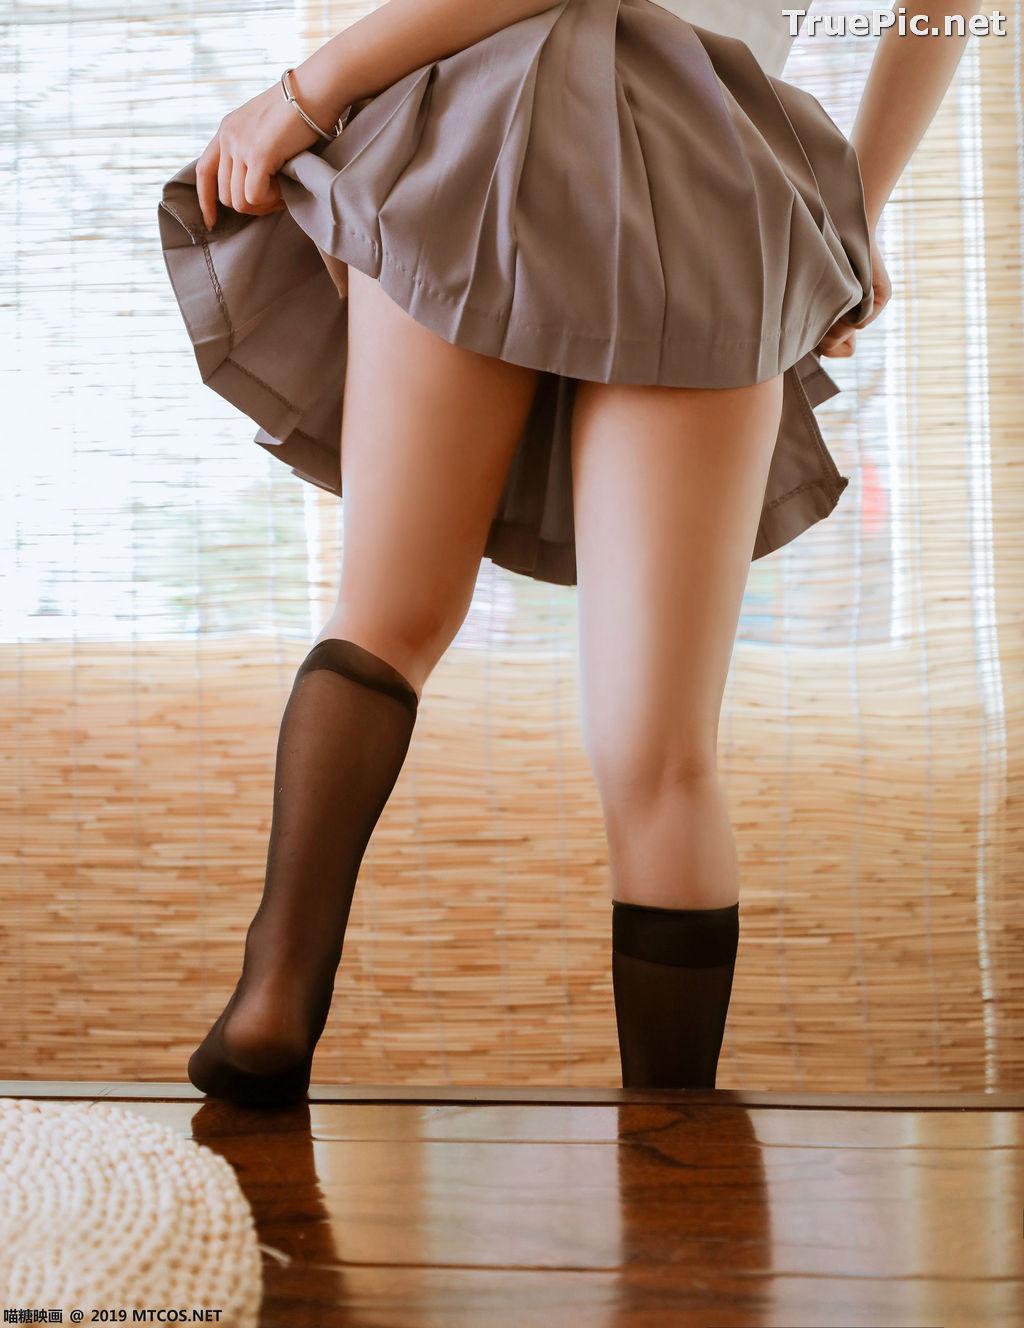 Image [MTCos] 喵糖映画 Vol.039 – Chinese Cute Model – Japanese School Uniform - TruePic.net - Picture-2